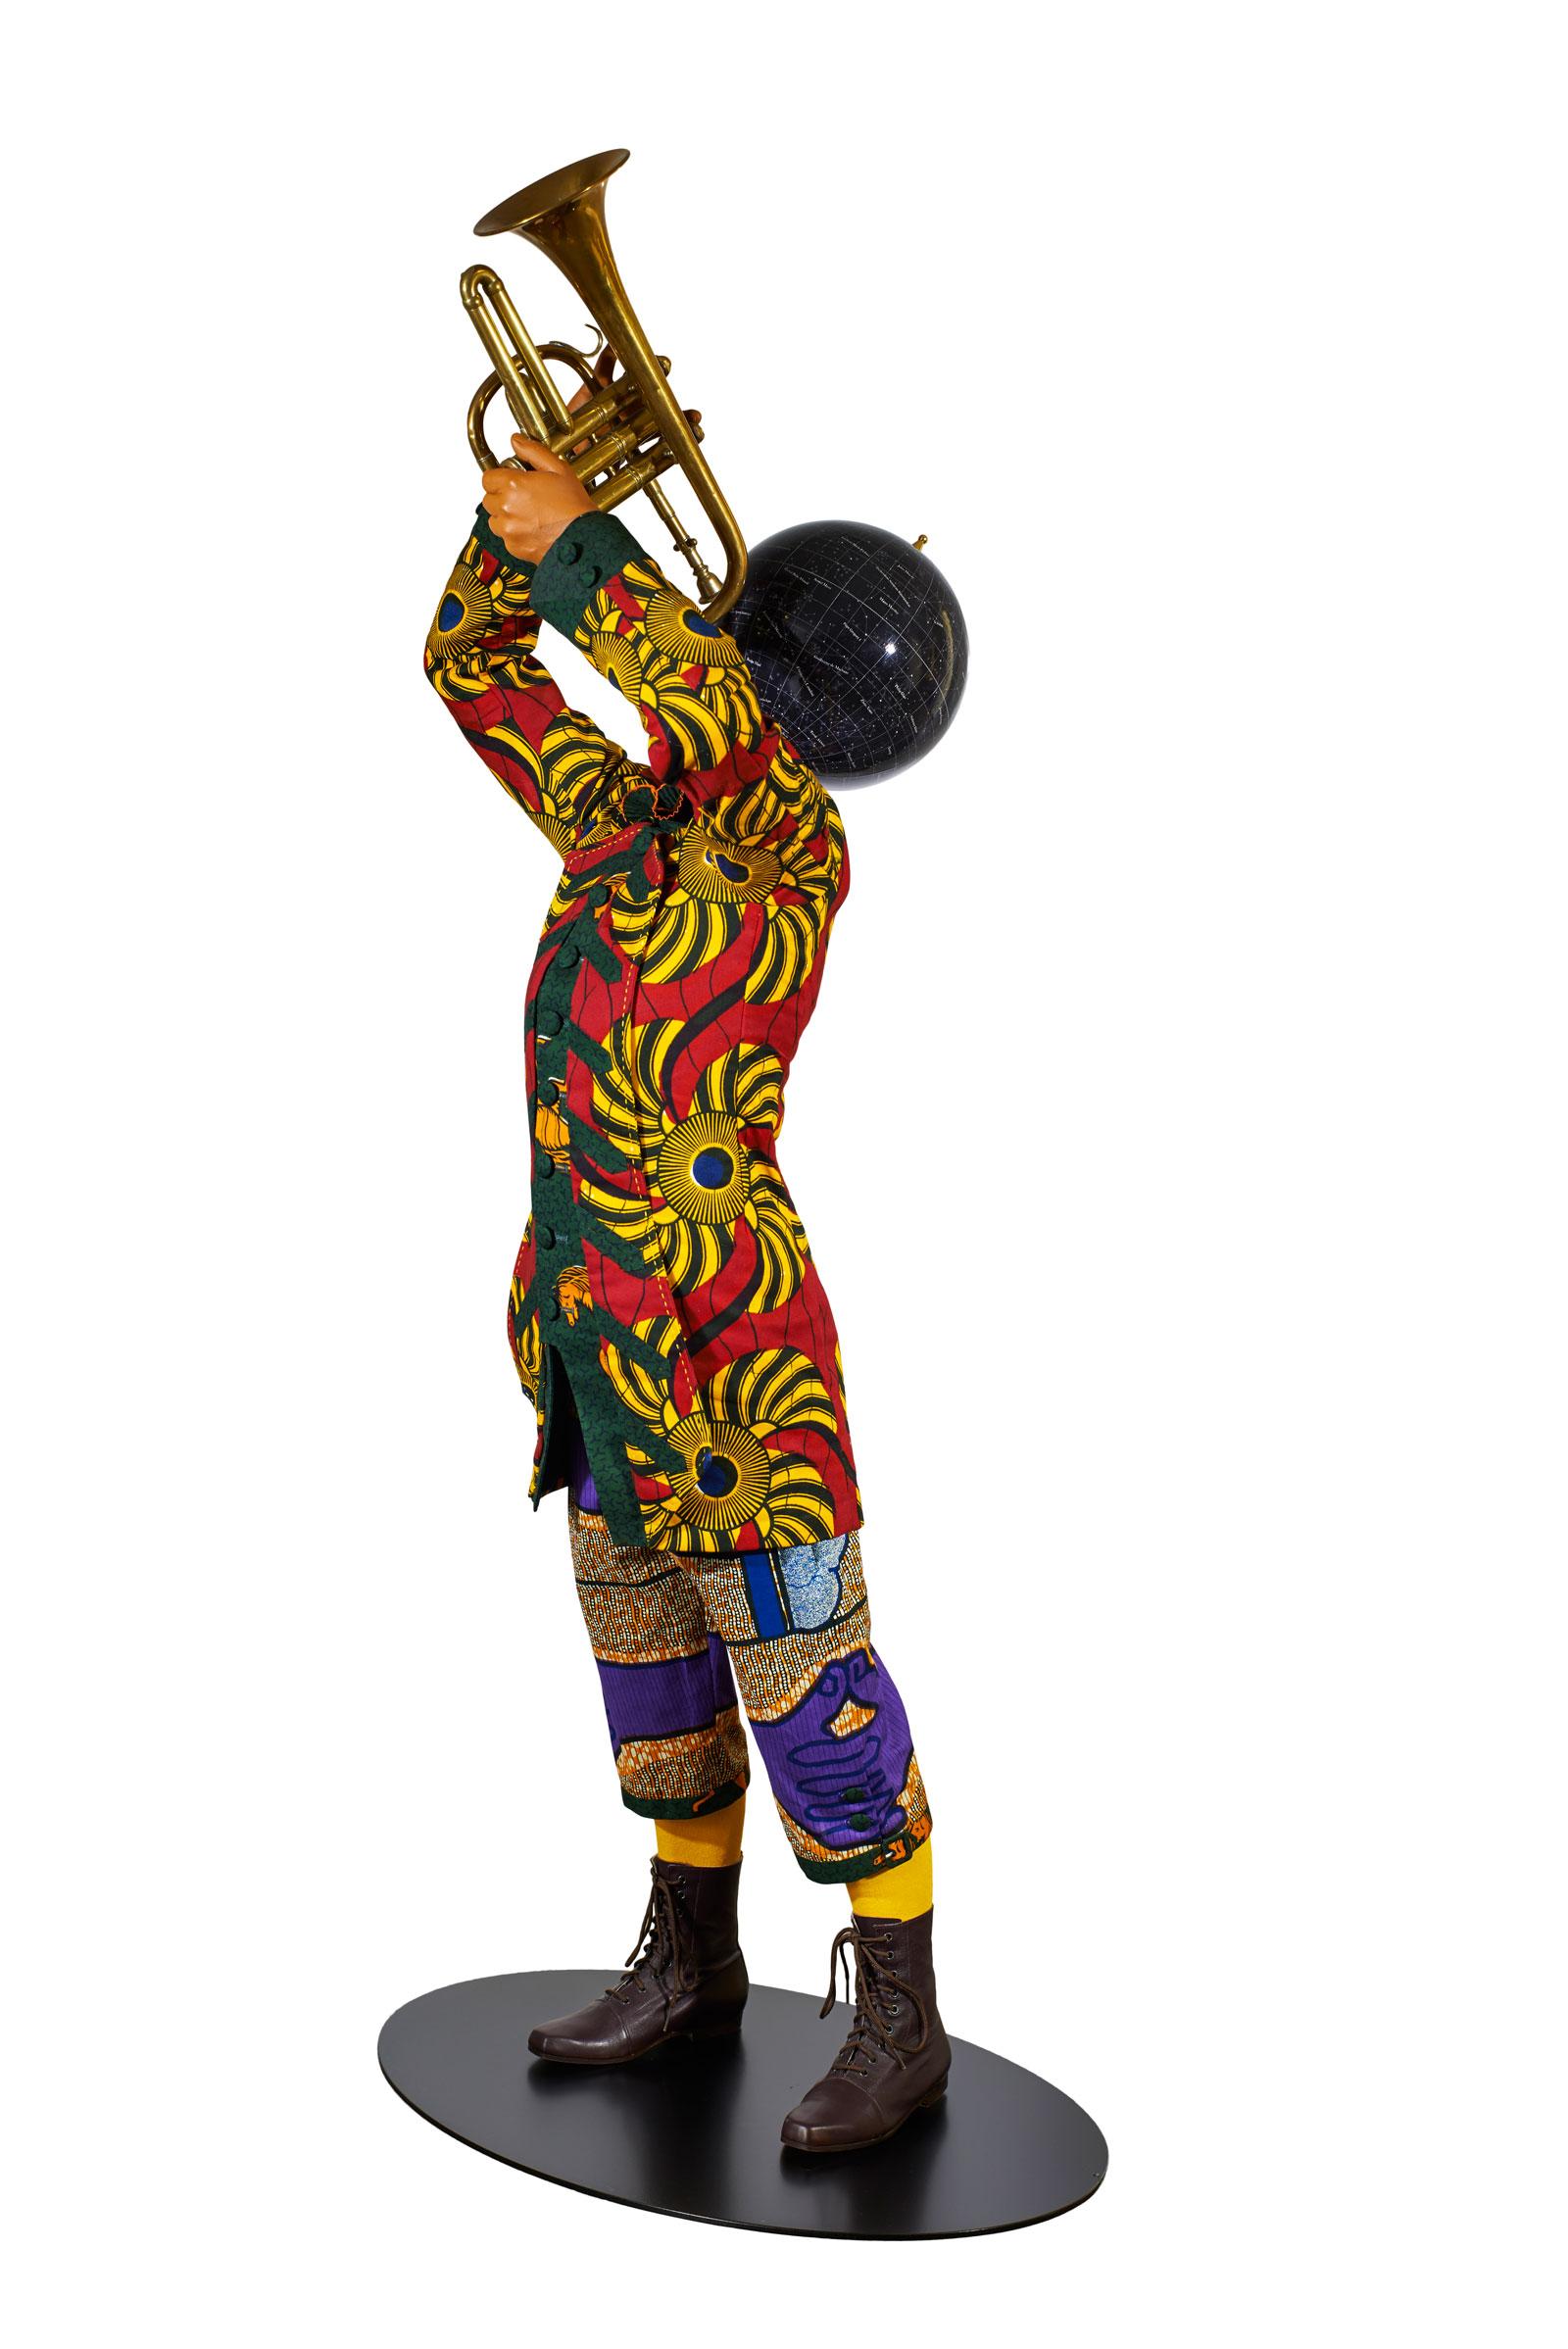 Yinka Shonibare: Trumpet Boy, 2010